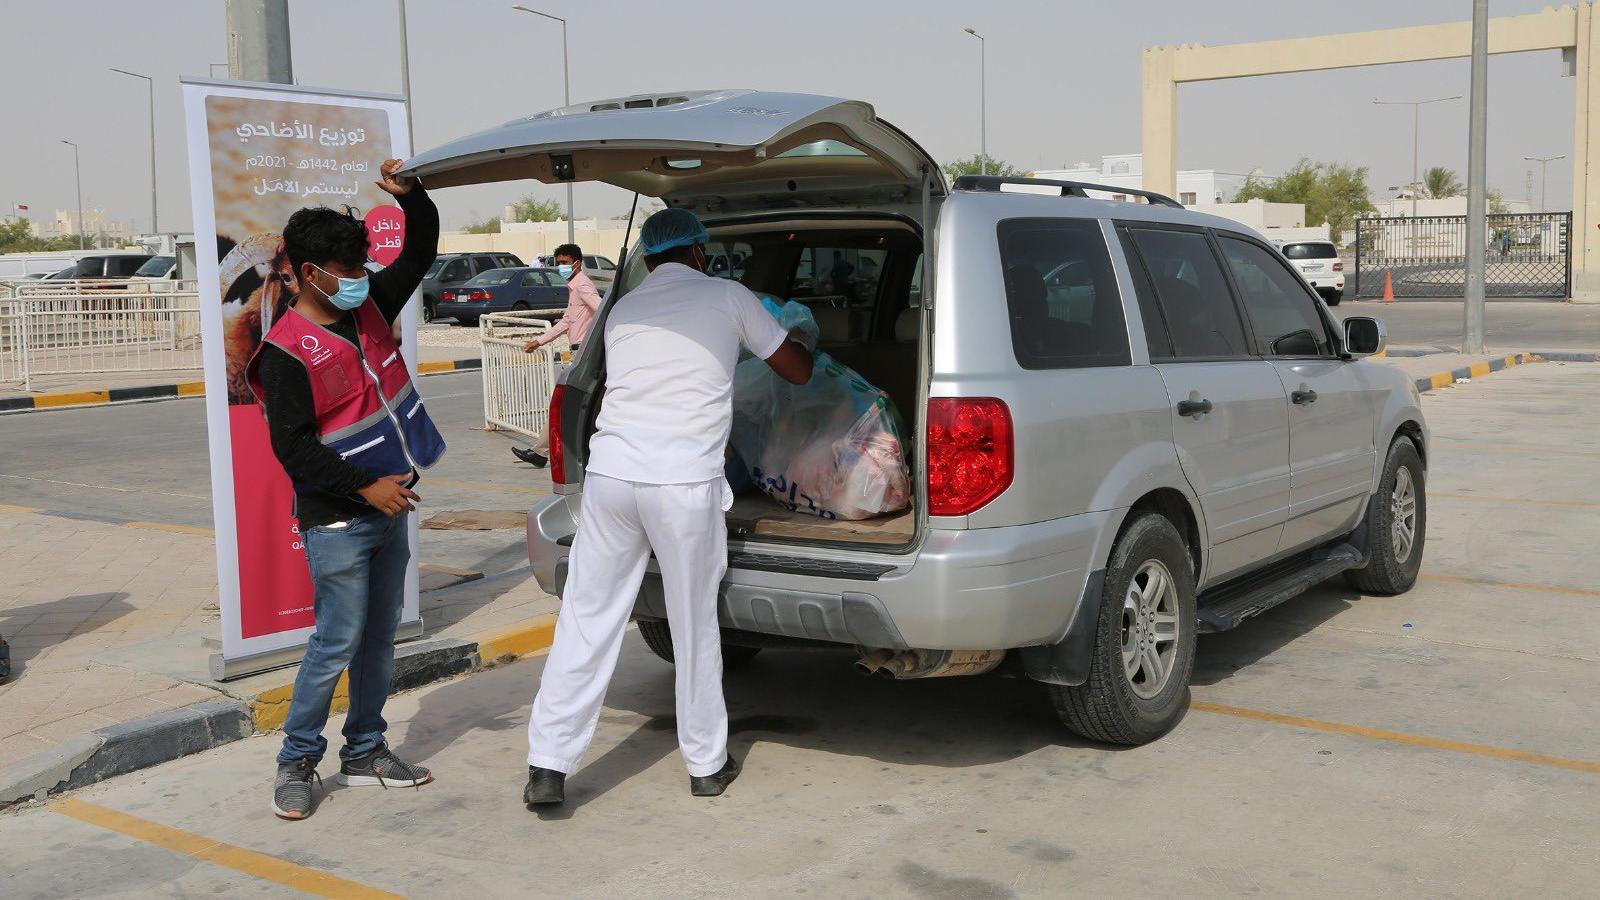 Qatar Charity distributes Udiyah to over 46,000 during Eid Al-Adha